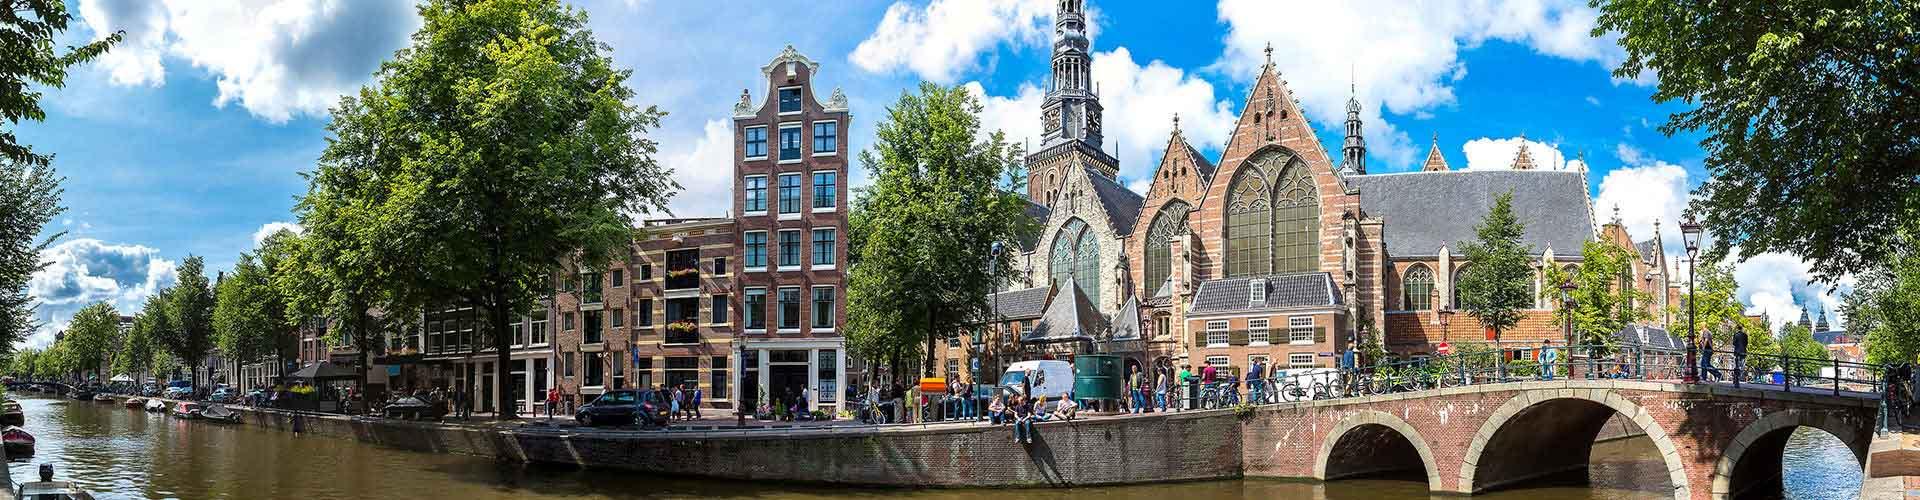 Amsterdam - Hoteles baratos cerca a Oude Kerk. Mapas de Amsterdam, Fotos y comentarios de cada Hotel en Amsterdam.